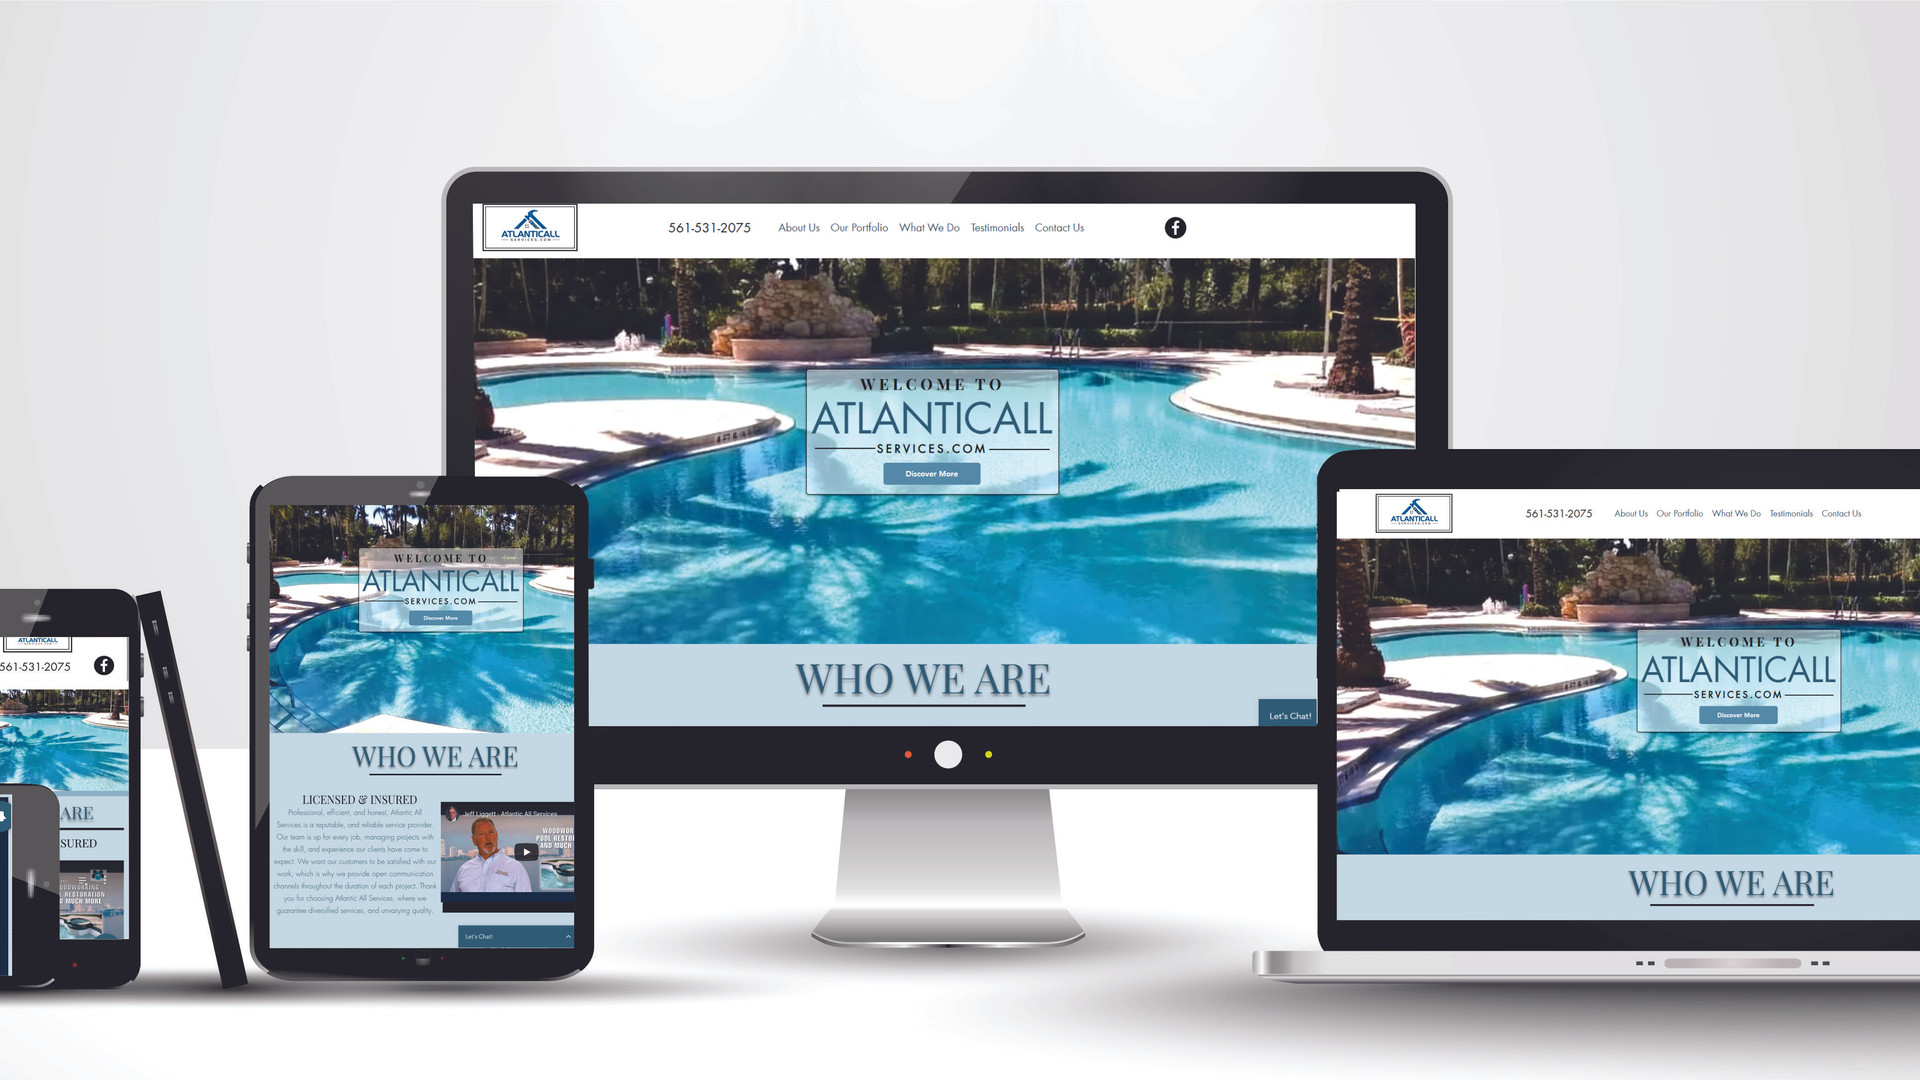 Atlanticall Services